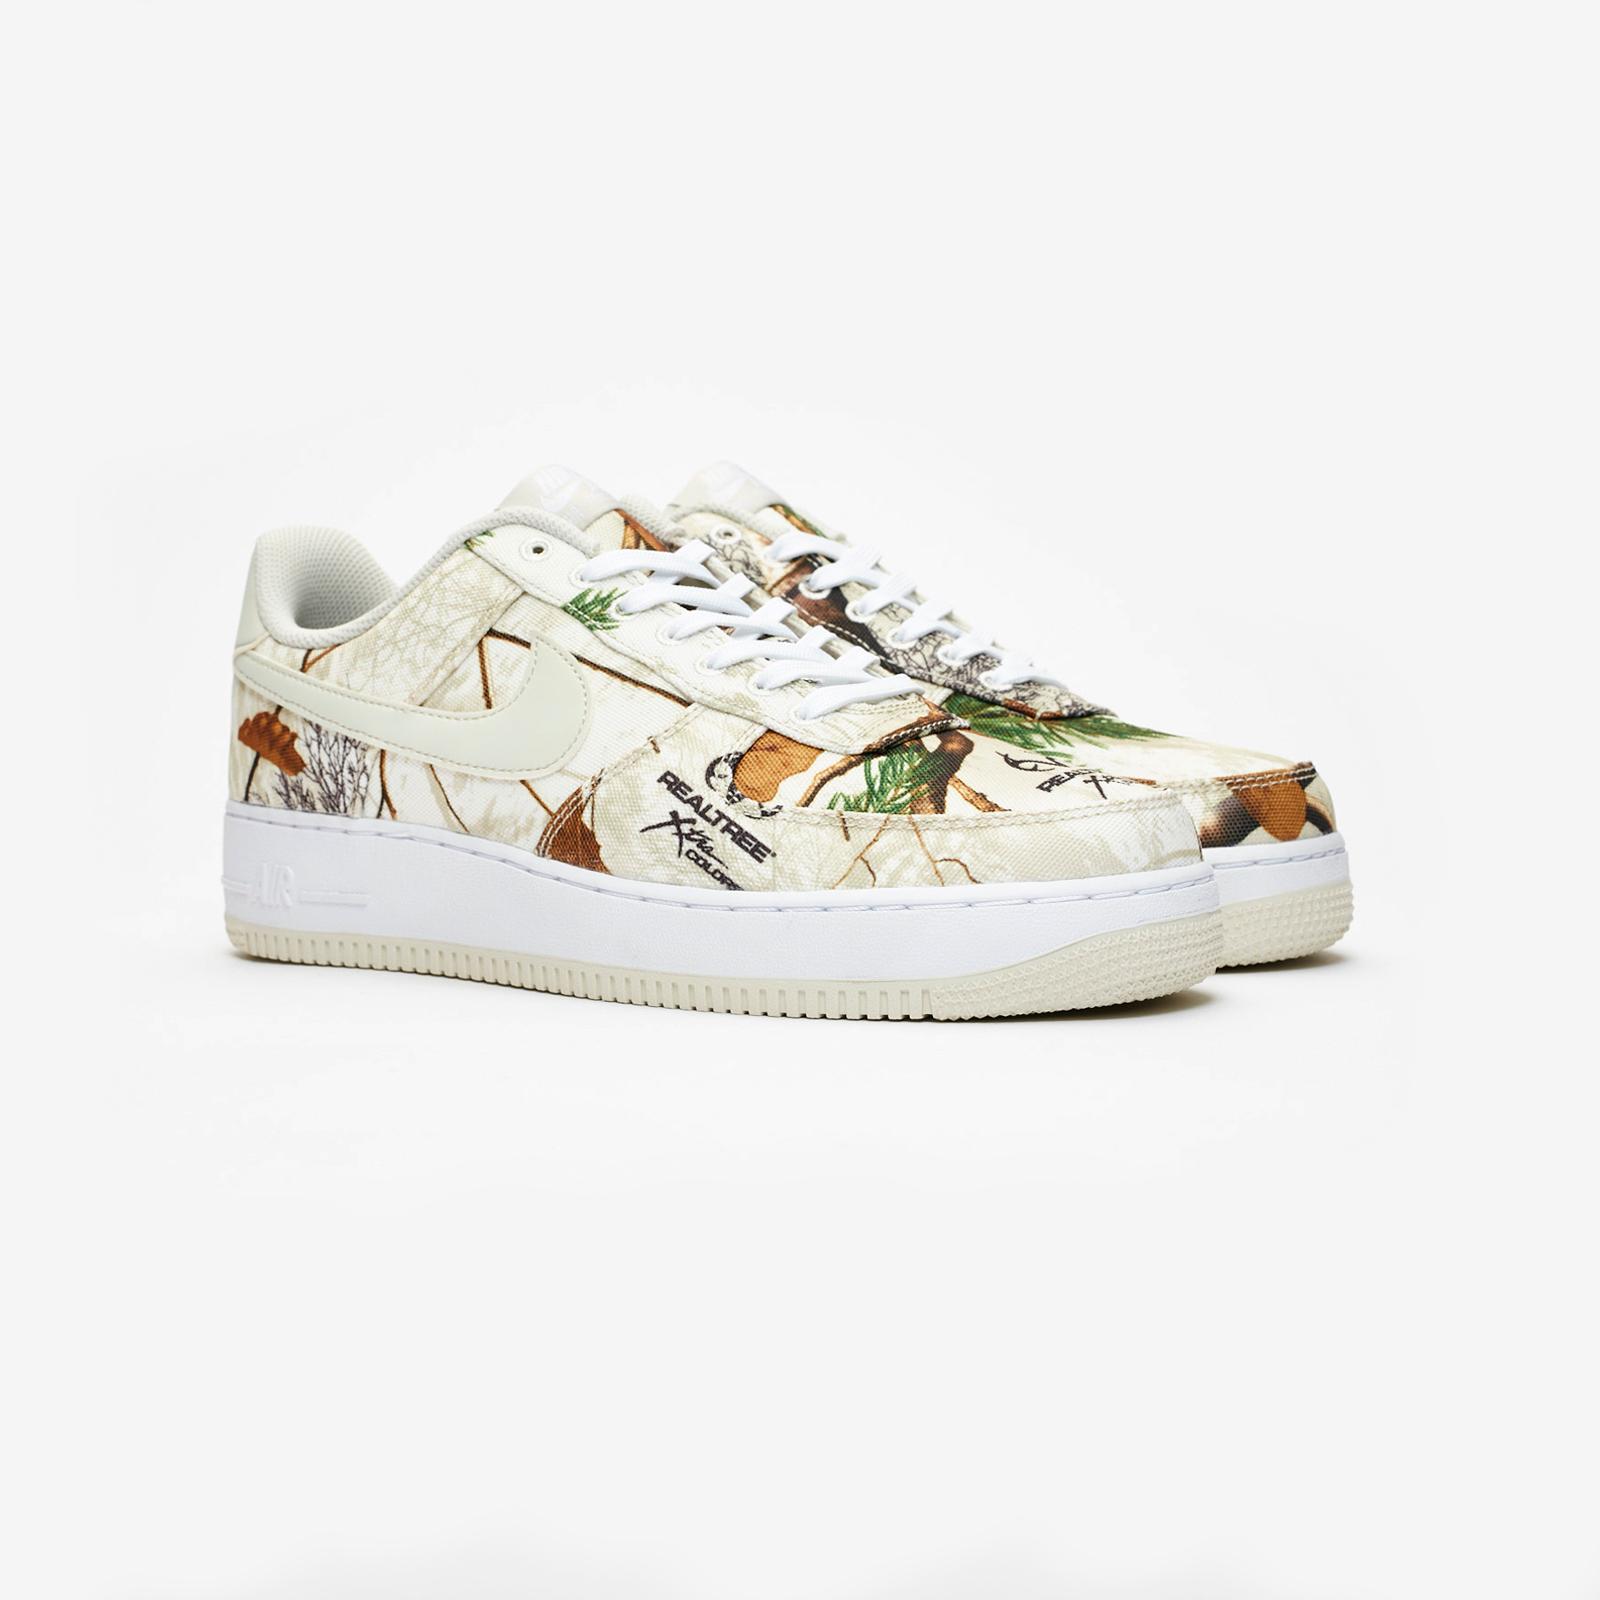 47391eaa61a95 Nike Air Force 1 07 LV8 3 - Ao2441-100 - Sneakersnstuff | sneakers ...